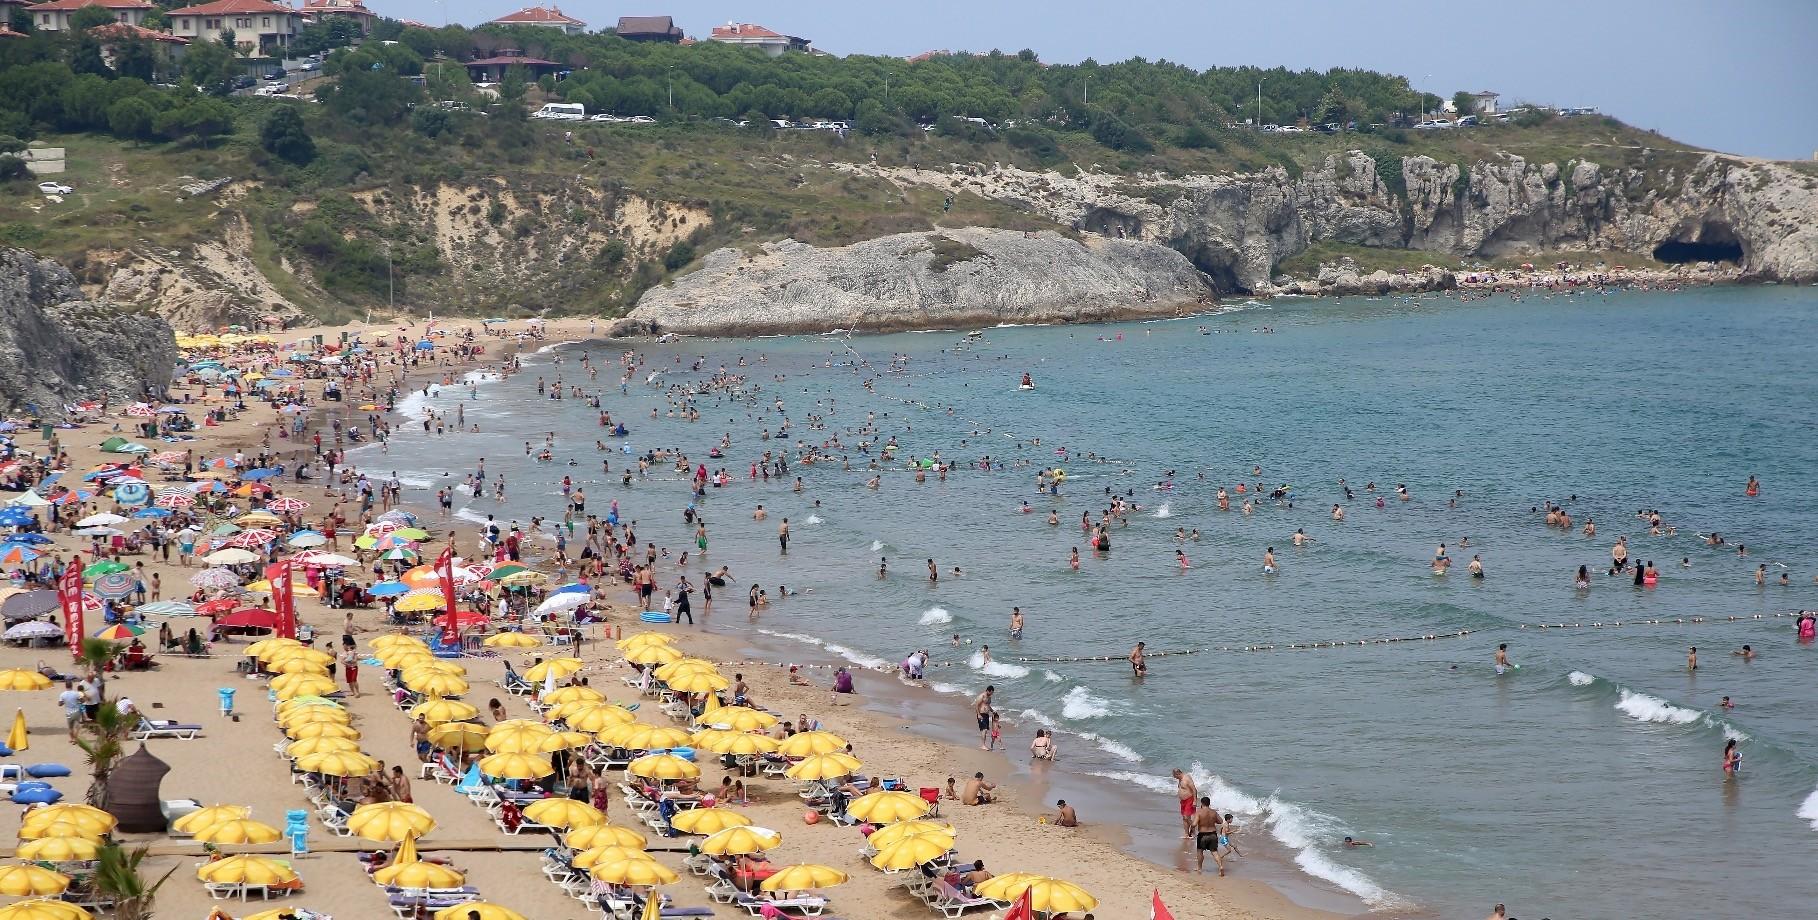 The beach is a popular weekend getaway.